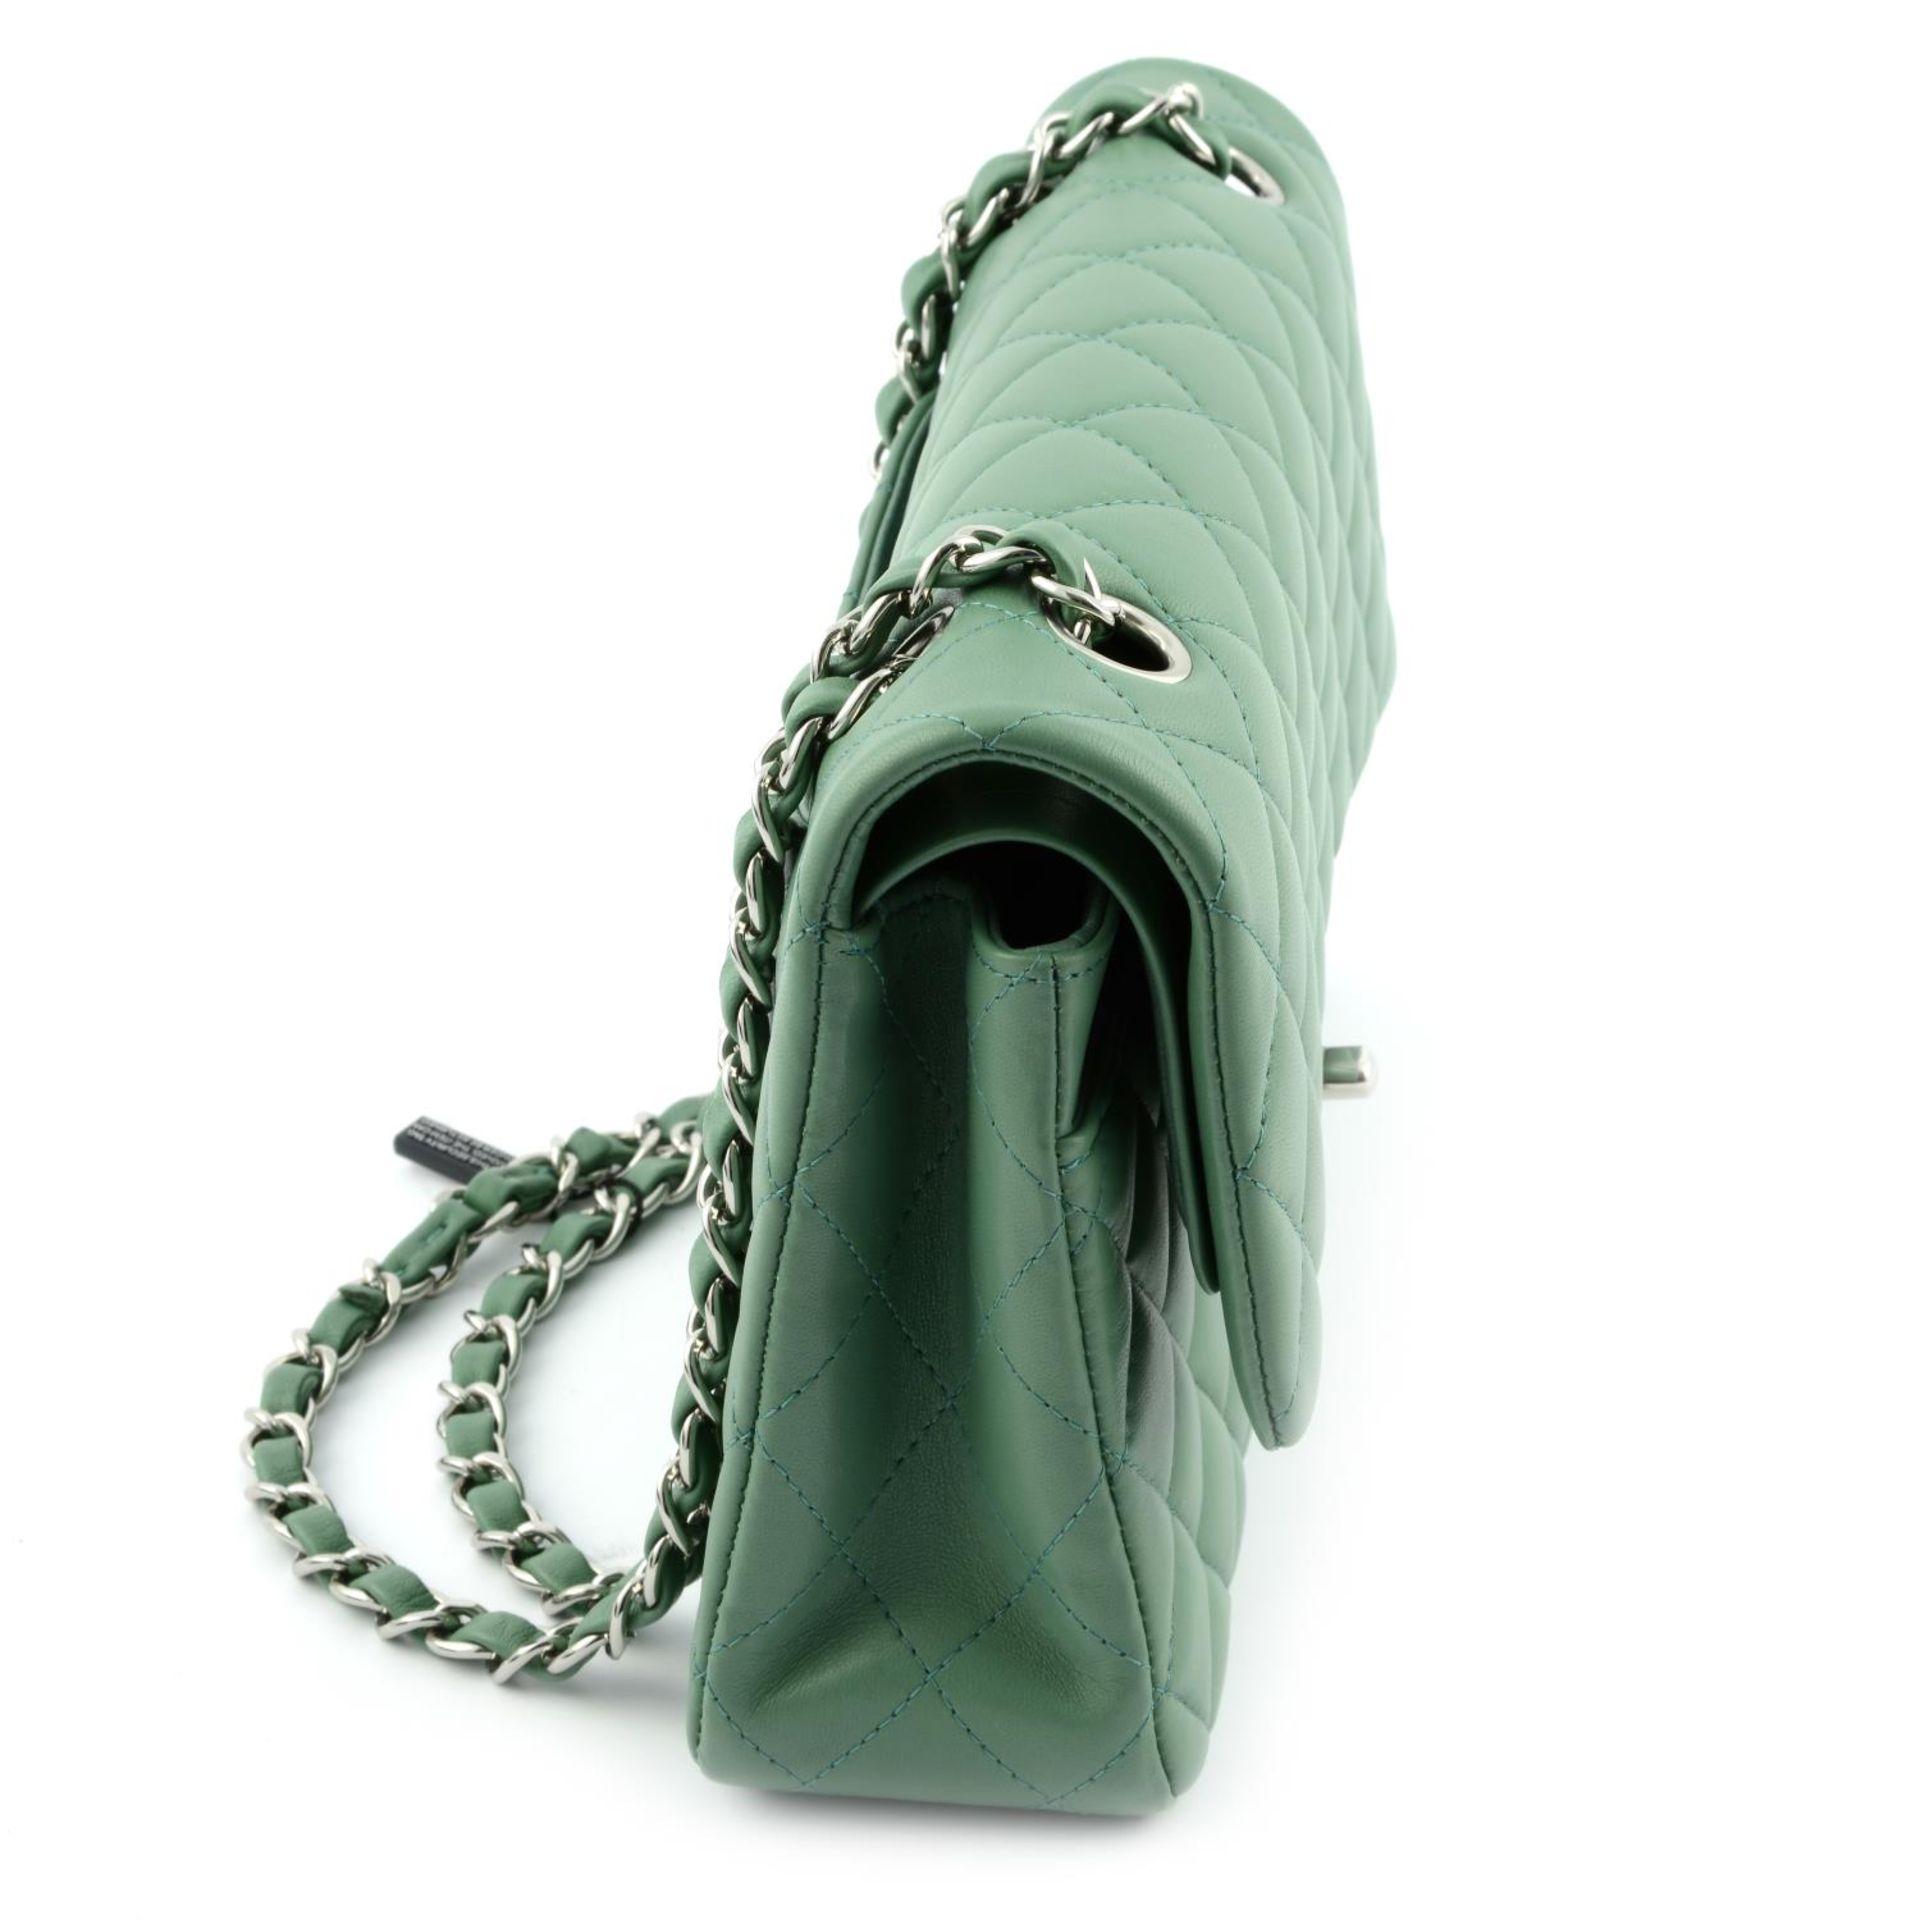 CHANEL - a green medium classic double flap handbag. - Image 4 of 7